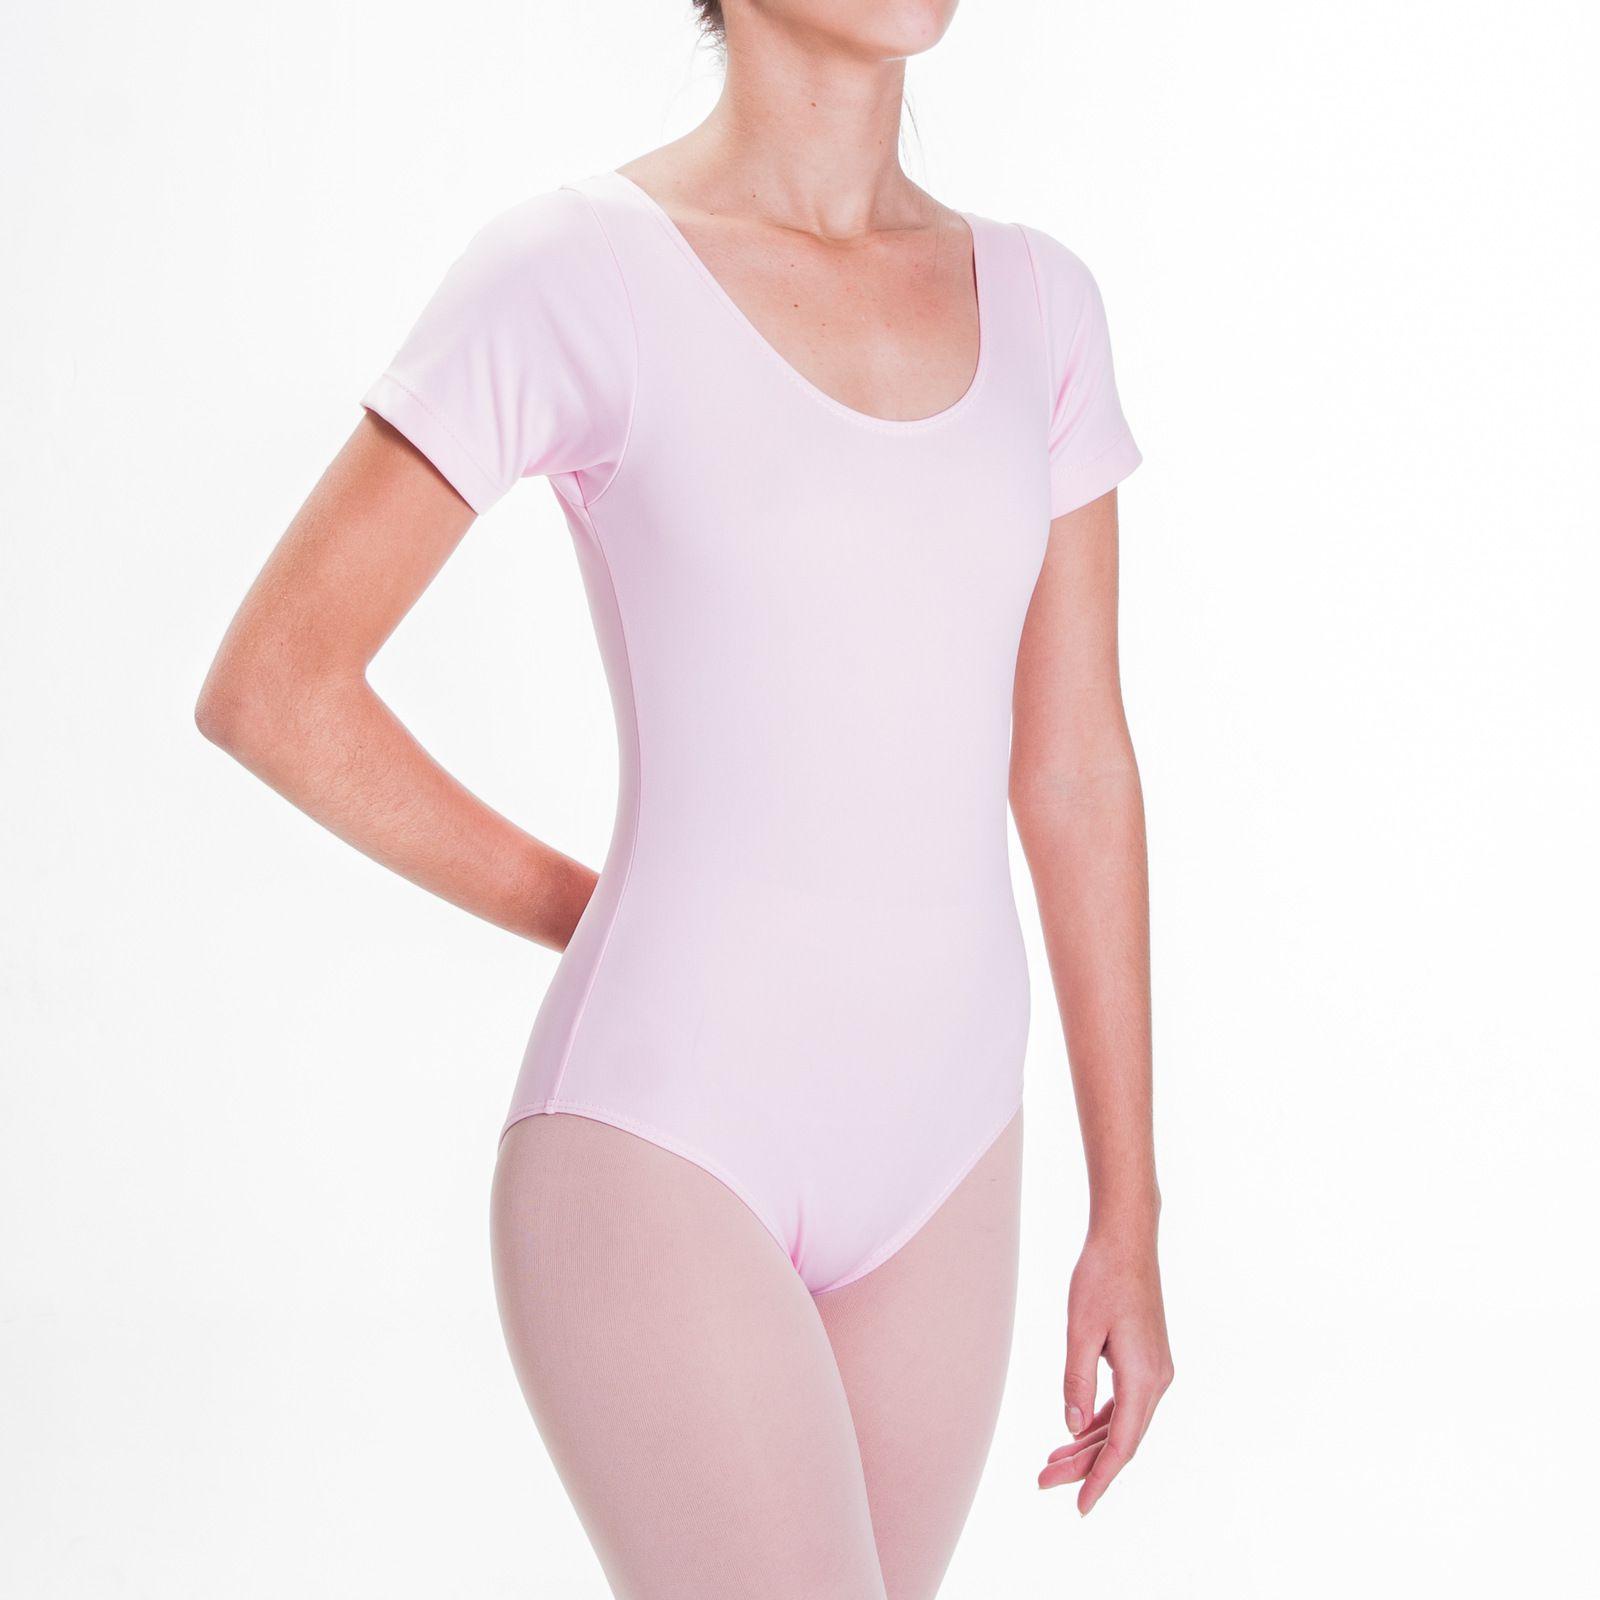 Collant Manga Curta Infantil para Ballet (1003)